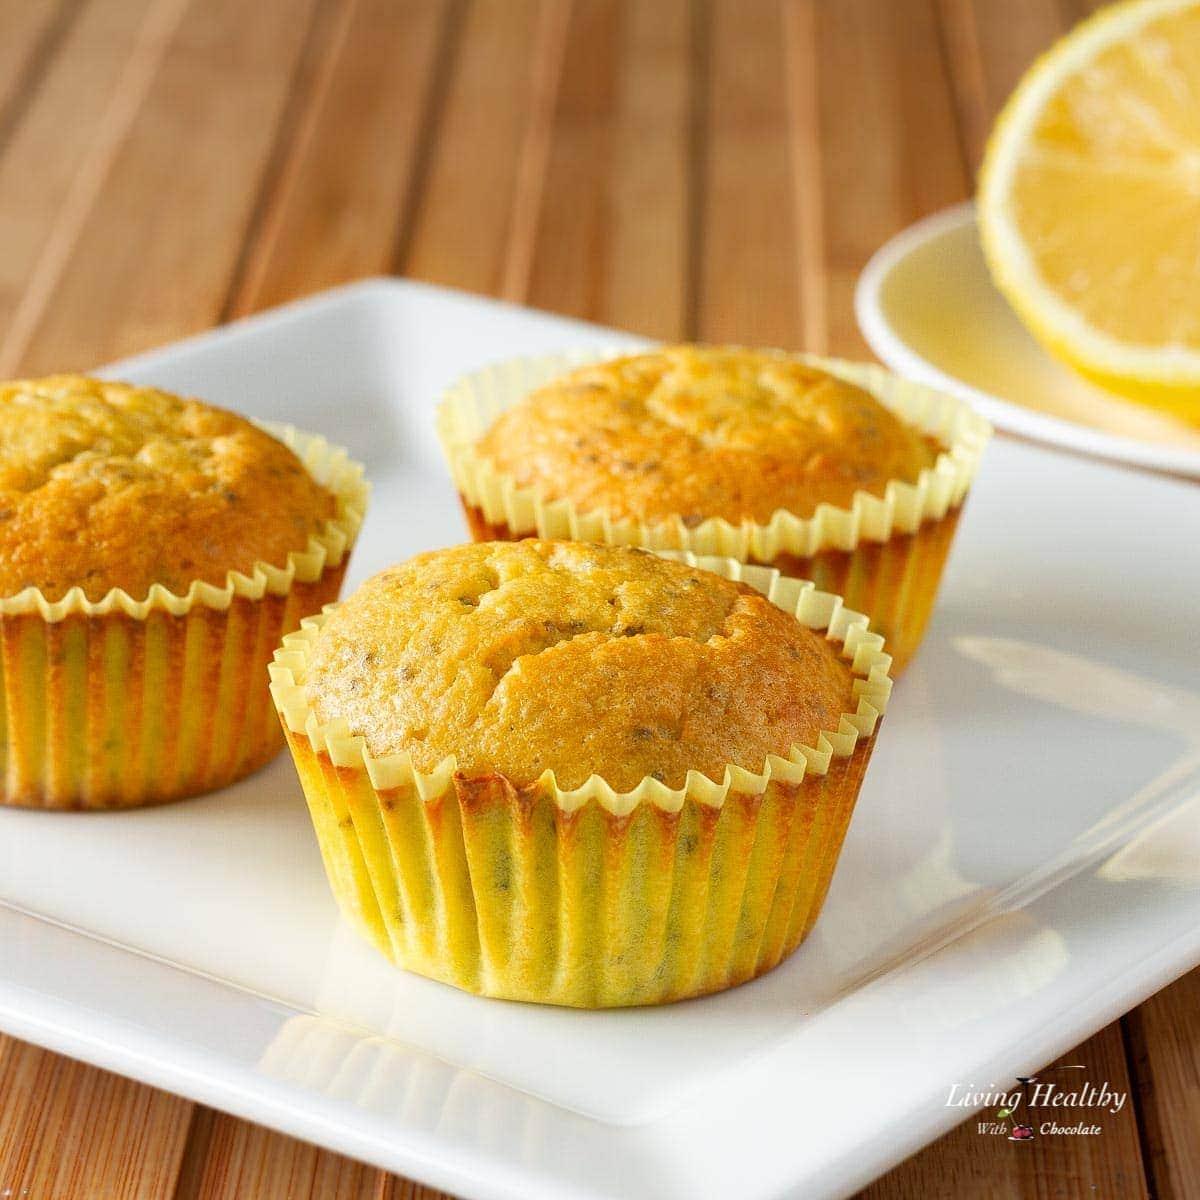 Chia Seed Lemon Muffins • paleo, nut-free, dairy-free, grain-free, gluten-free, refined sugar-free